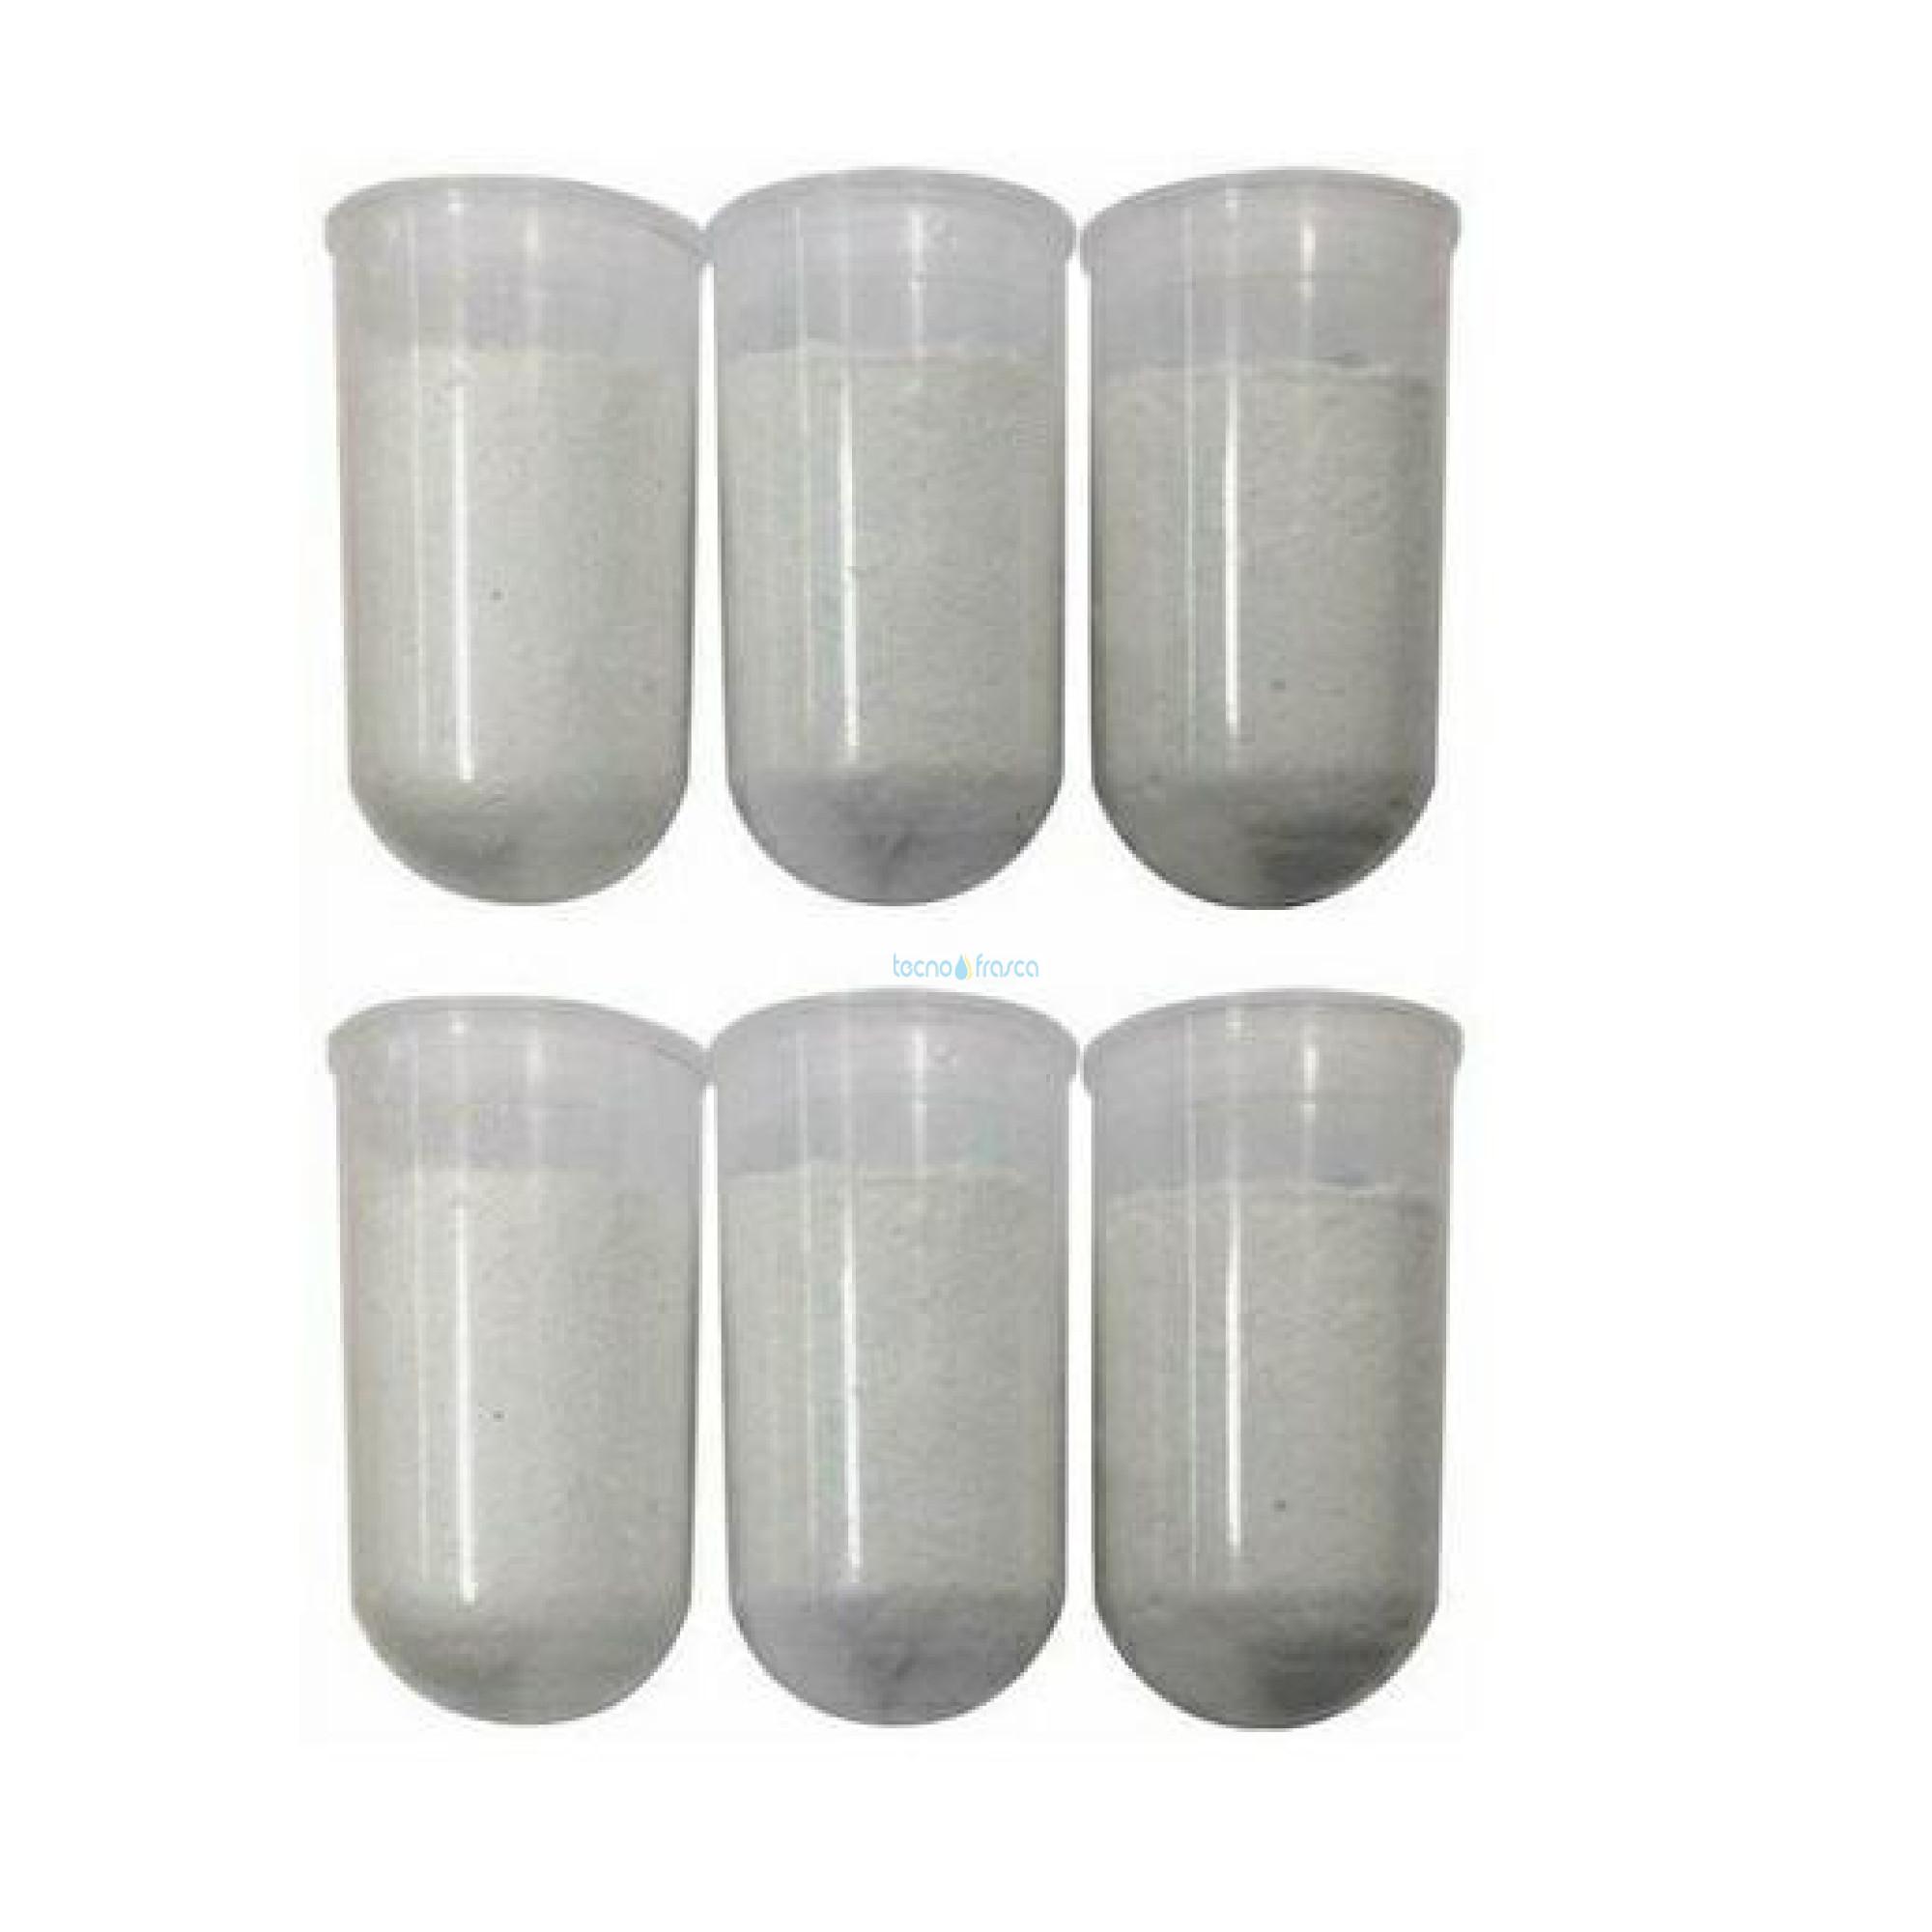 Ricarica universale polifosfati maxipolyquick blister 6 pz 10160300